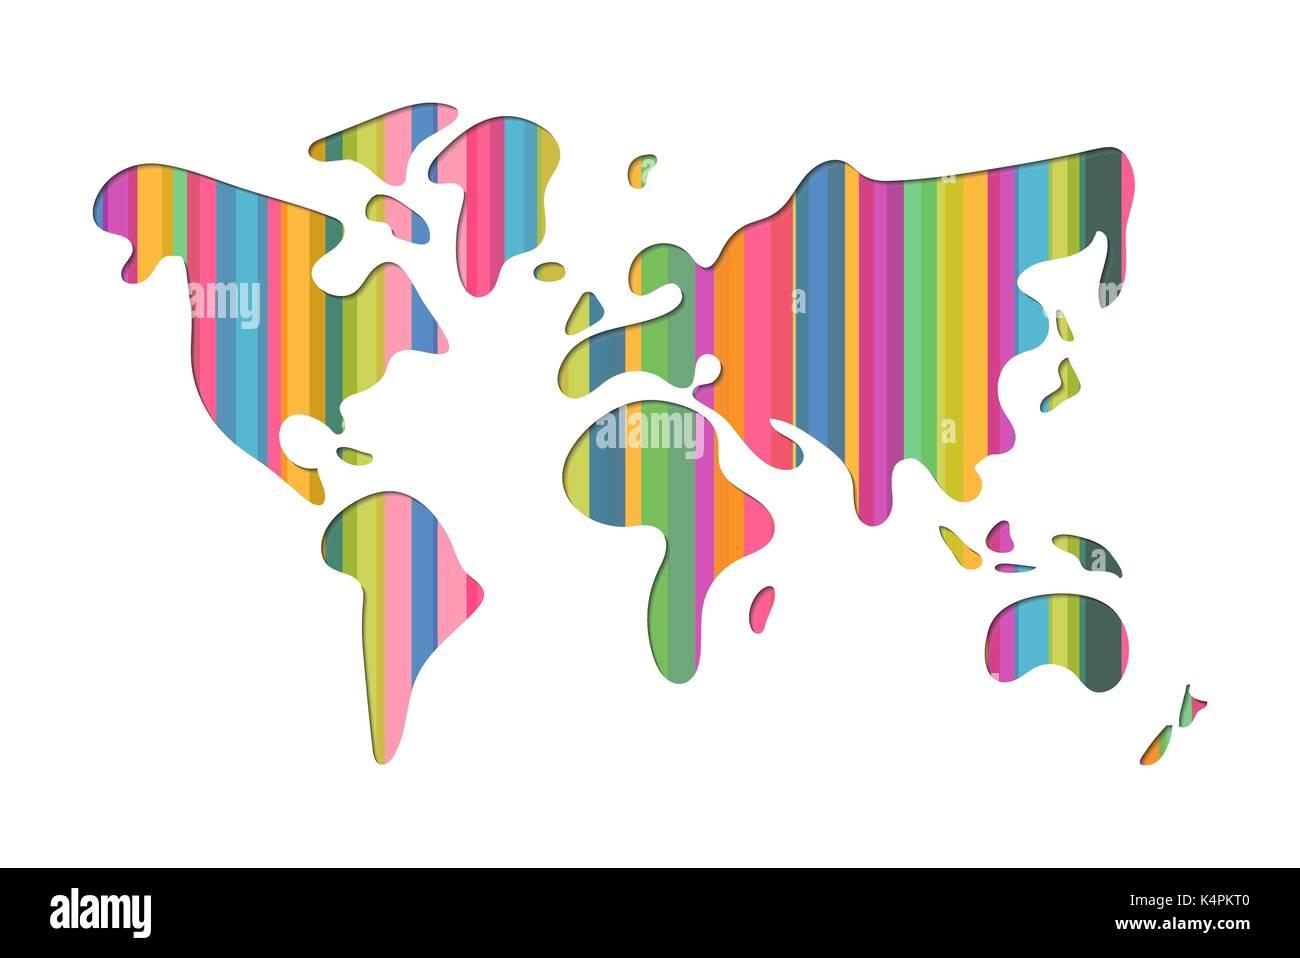 World Map Shape Illustration In Modern D Paper Cut Art Style - World map shape